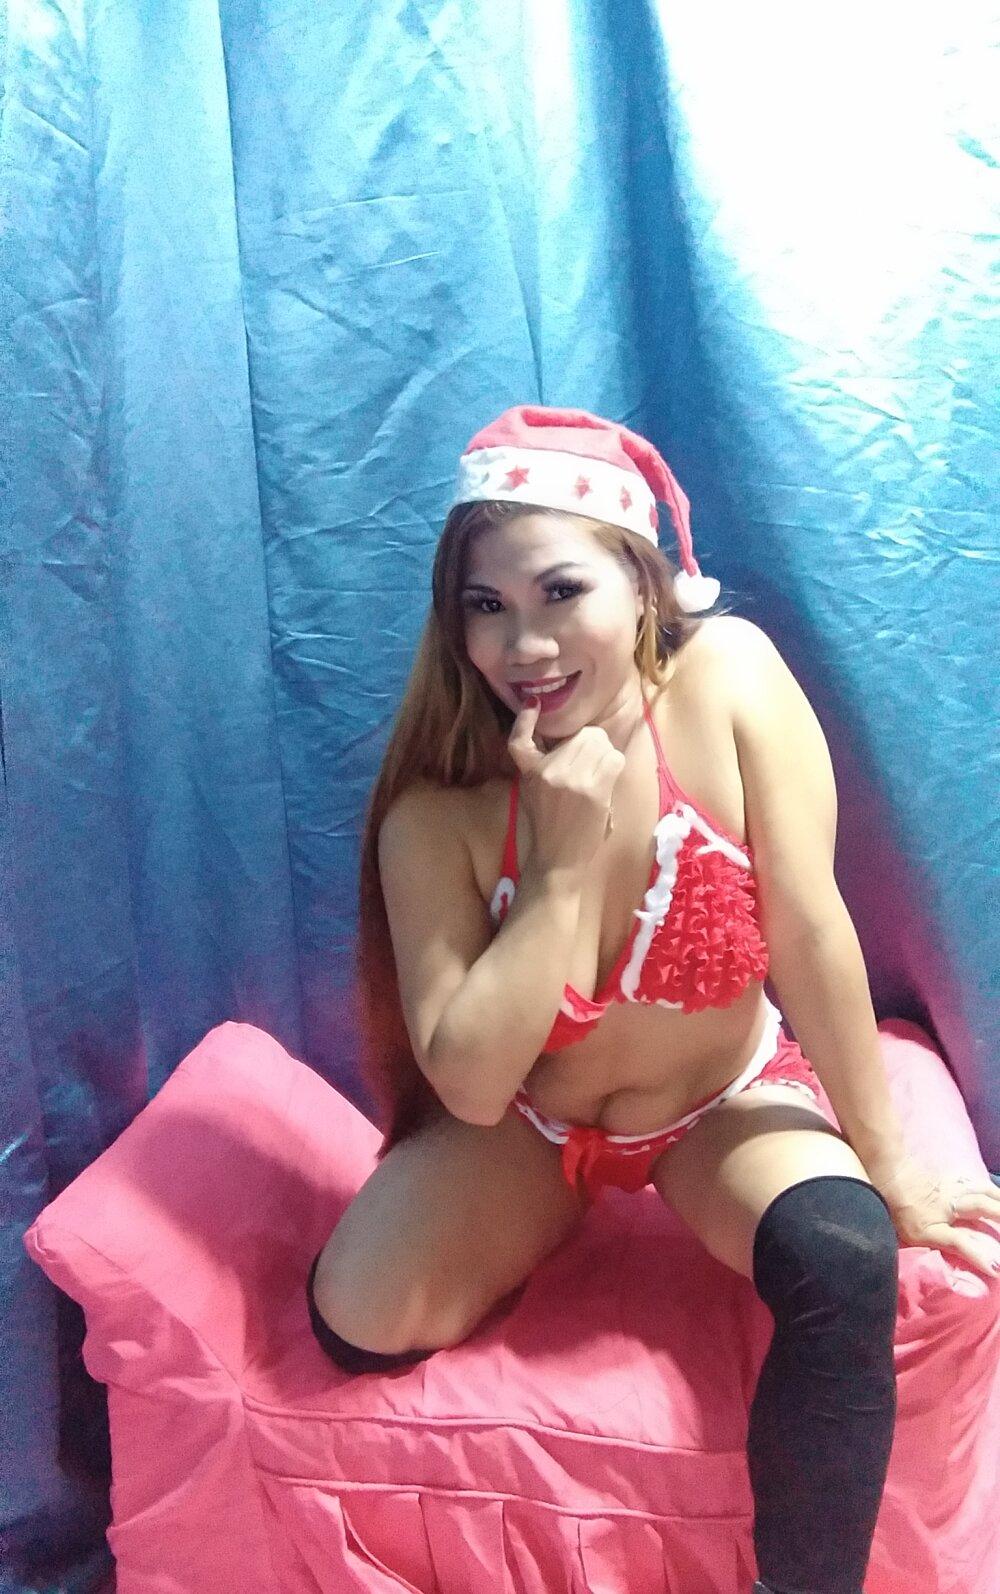 Asian_Obient_Slut at StripChat